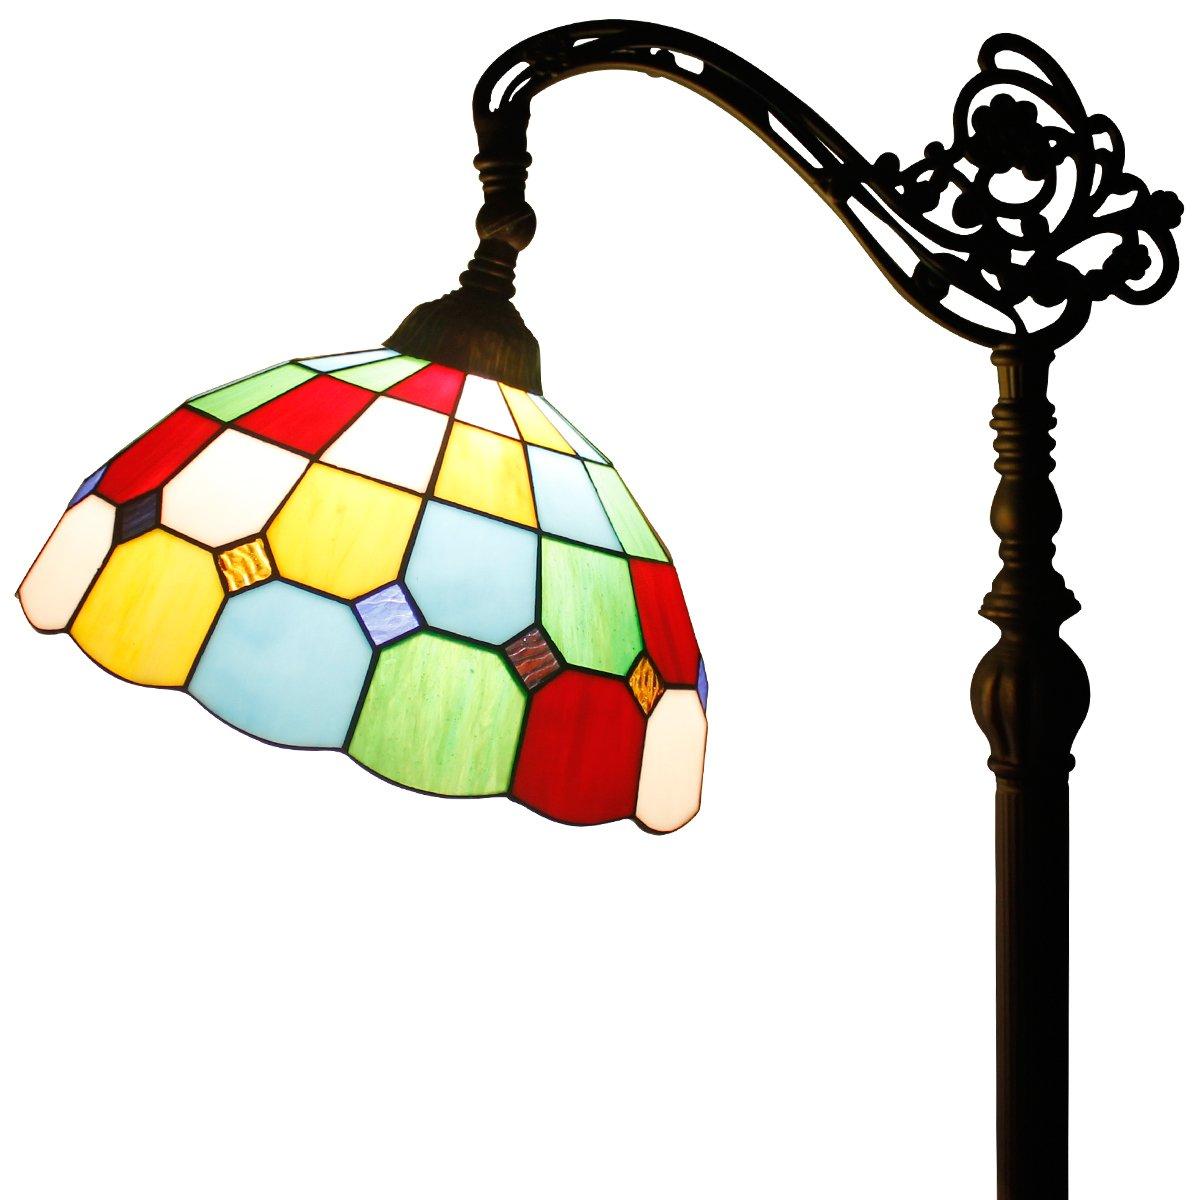 Tiffany Style Reading Floor Lamp Table Desk Lighting Tartan Design W12H64 E26 by werfactory (Image #1)